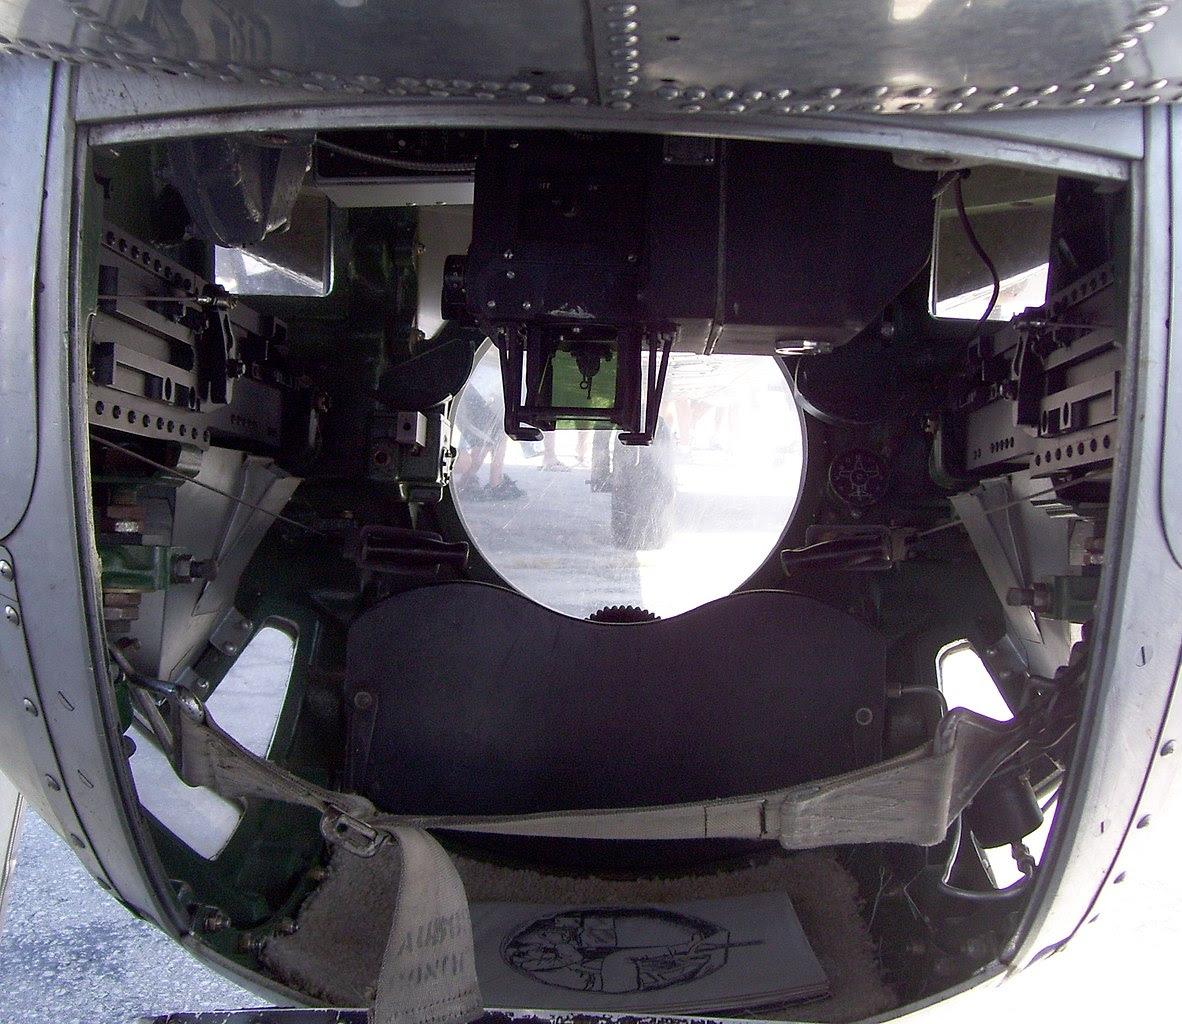 http://upload.wikimedia.org/wikipedia/commons/thumb/1/12/Ball_turret_inside_B-17.jpg/1182px-Ball_turret_inside_B-17.jpg